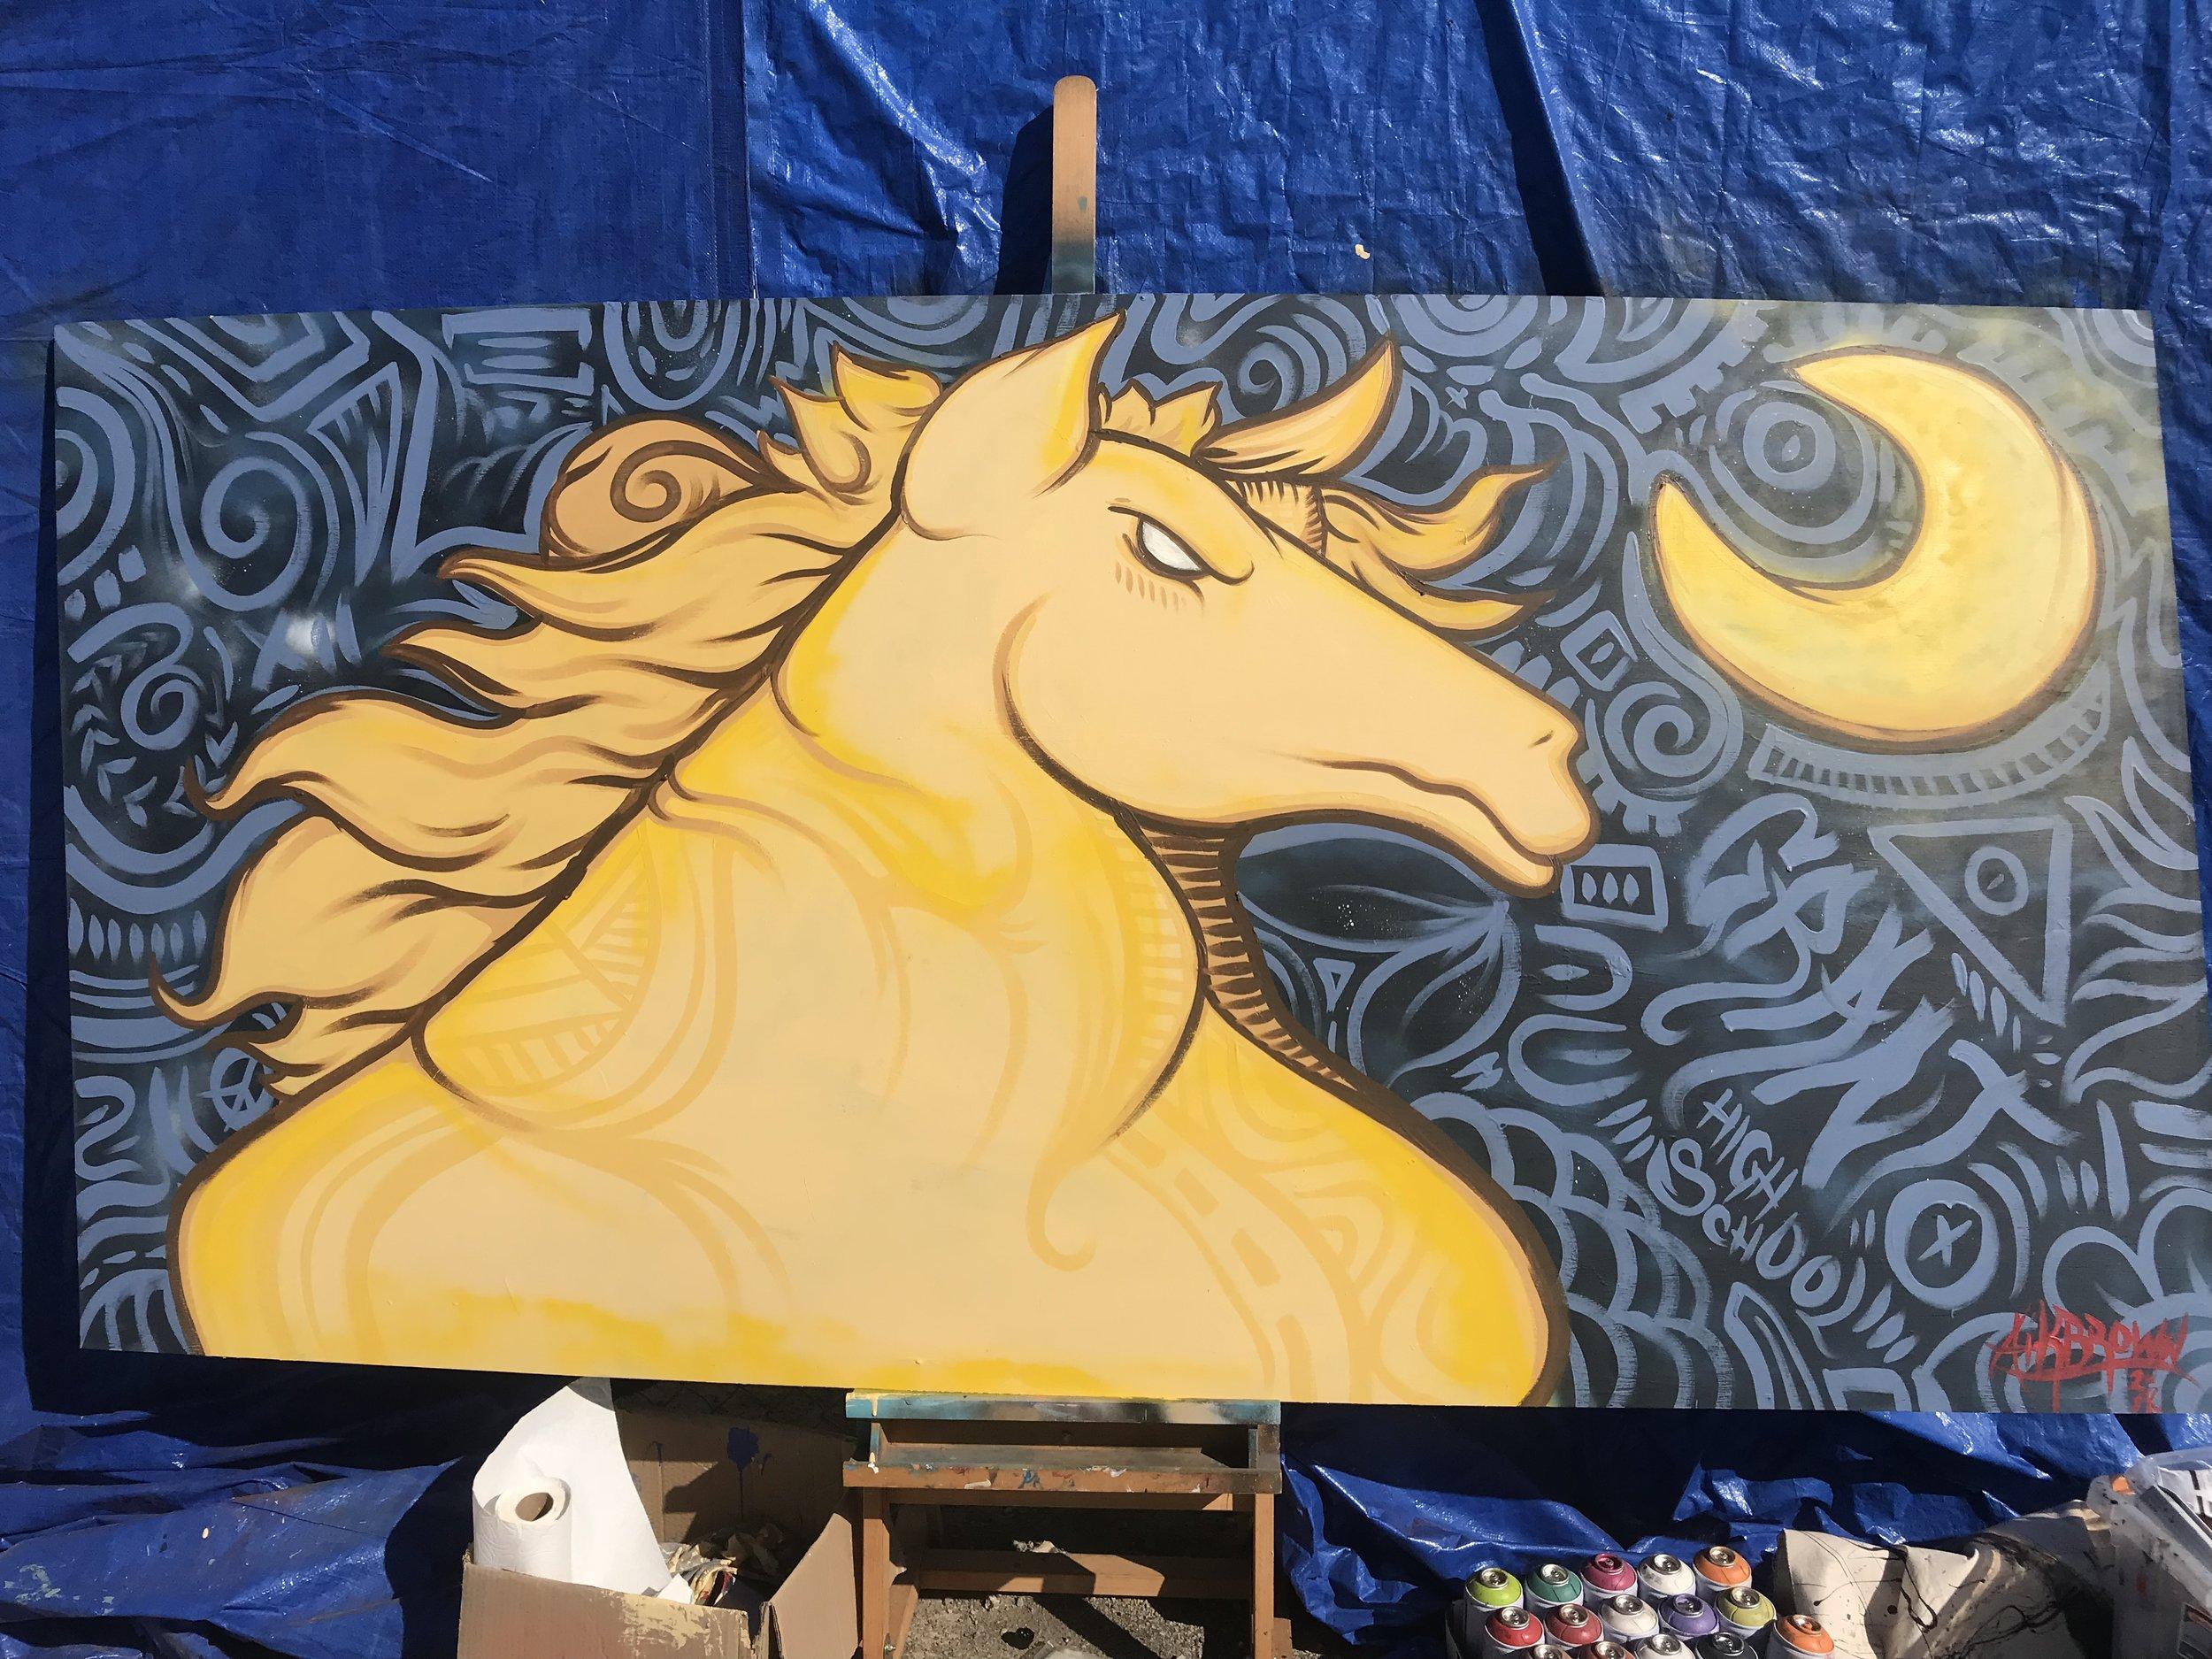 Pacers, Crocker Art Msueum's Block by Block Event, Grant High School, Sacramento, CA, 2018.jpg